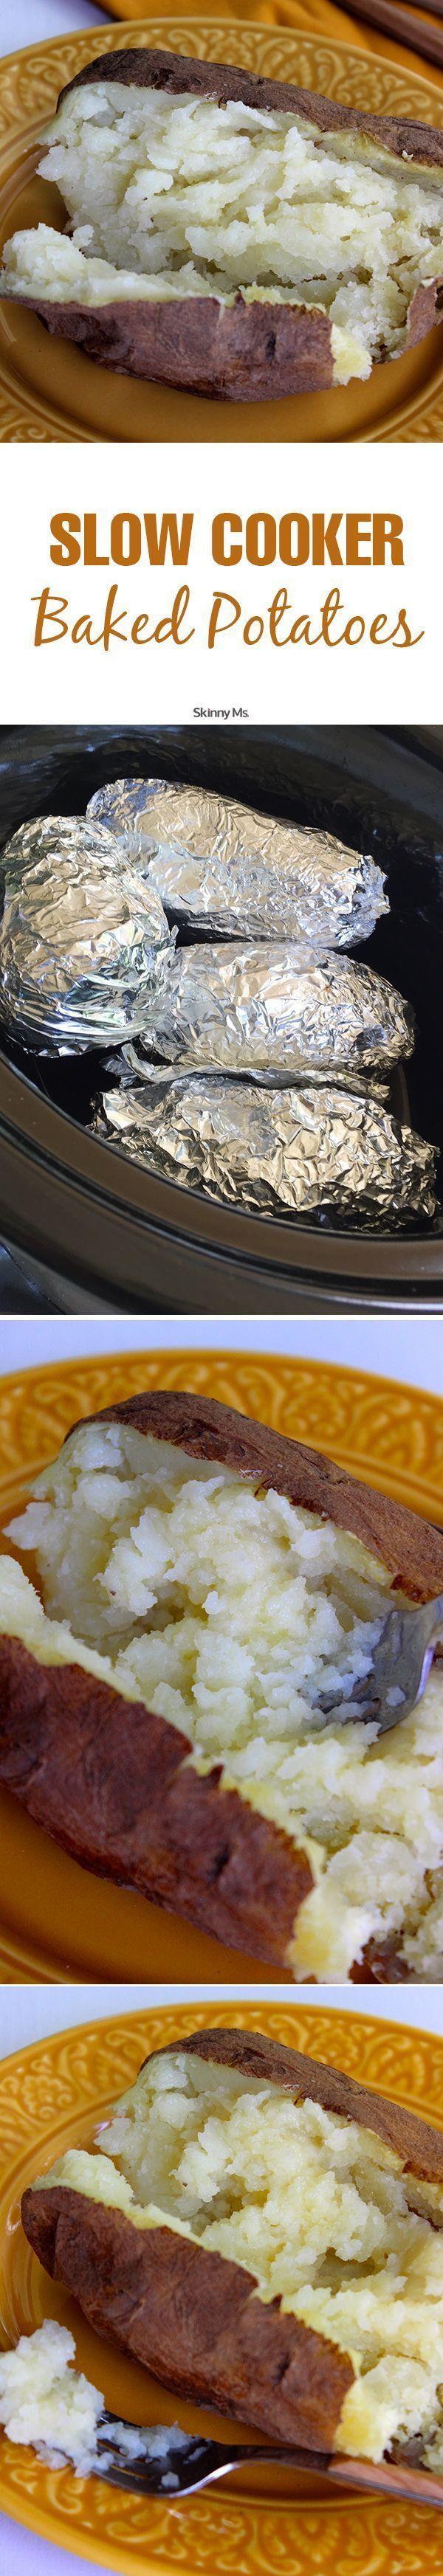 871 best slow cooking crock pot images on pinterest